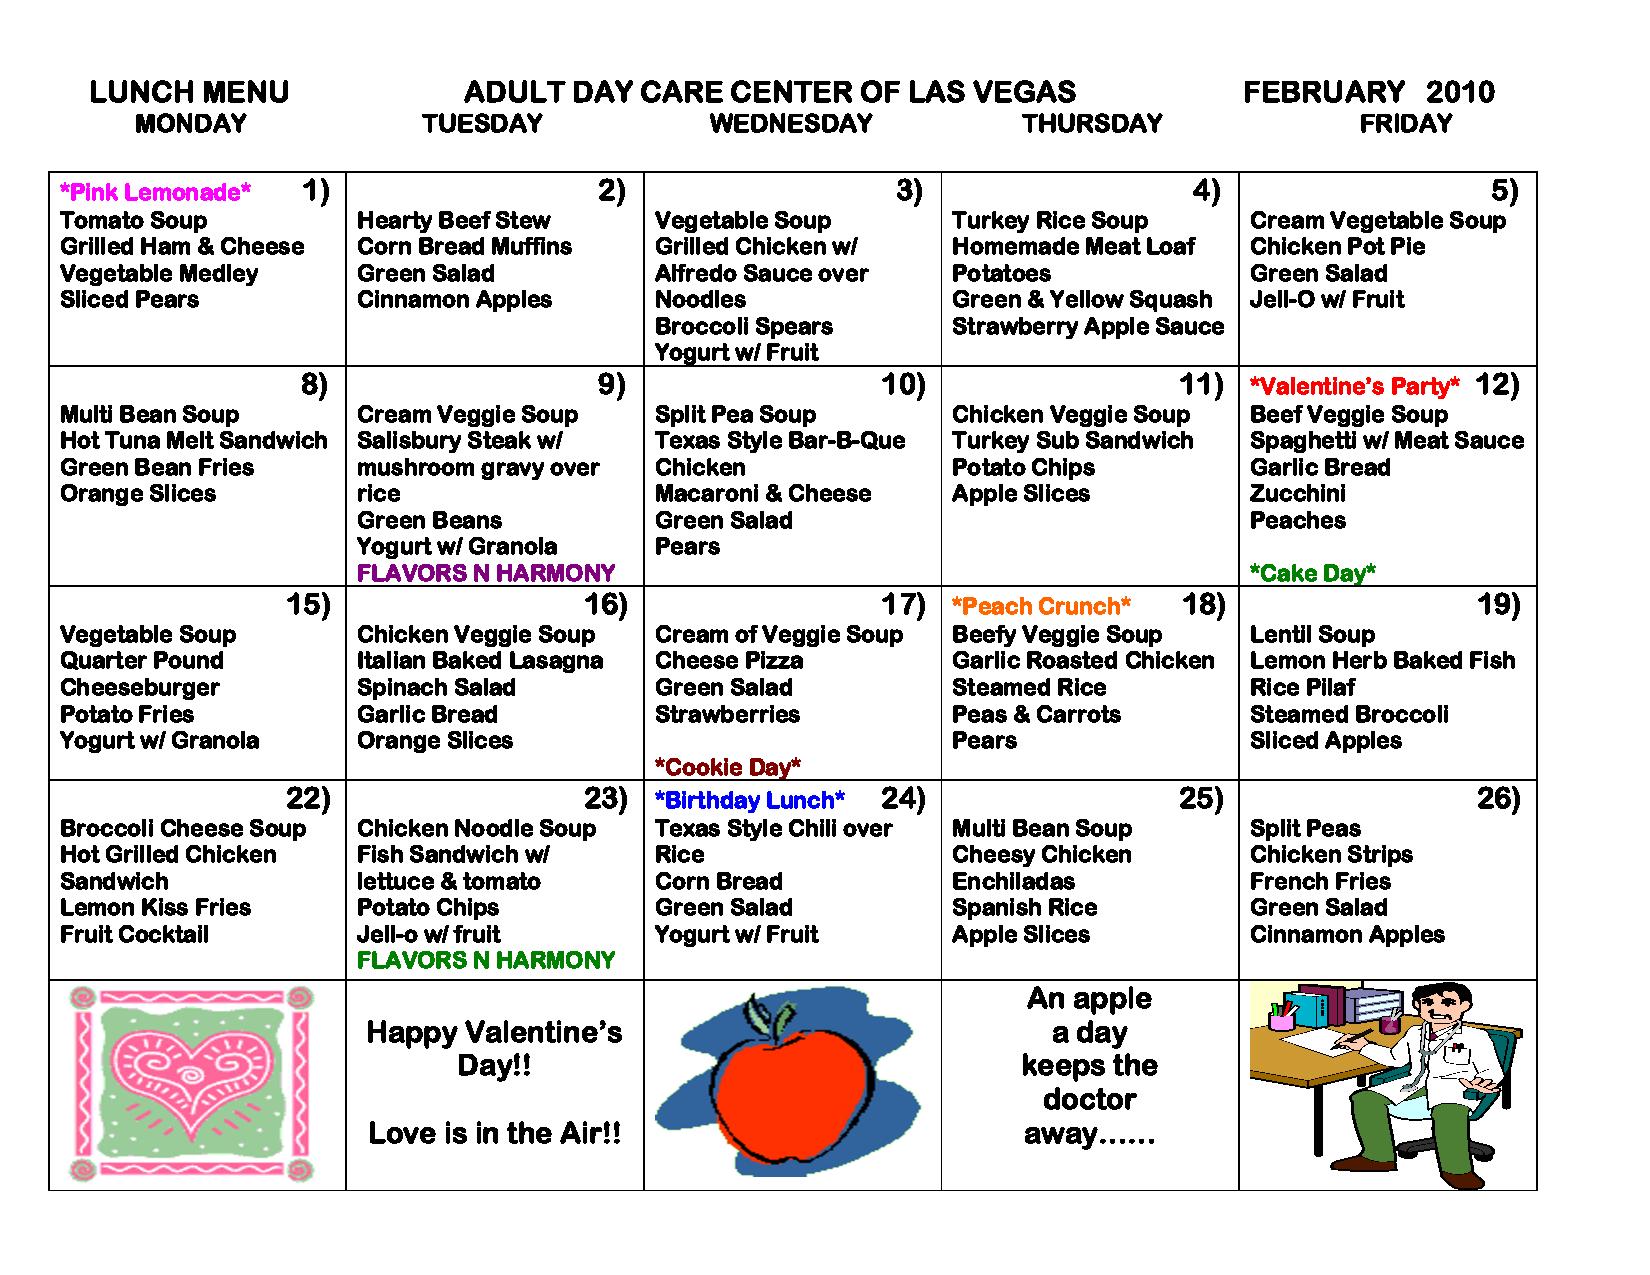 Free Daycare Menus To Print   Similiar Printable Blank Day Care - Free Printable Daycare Menus